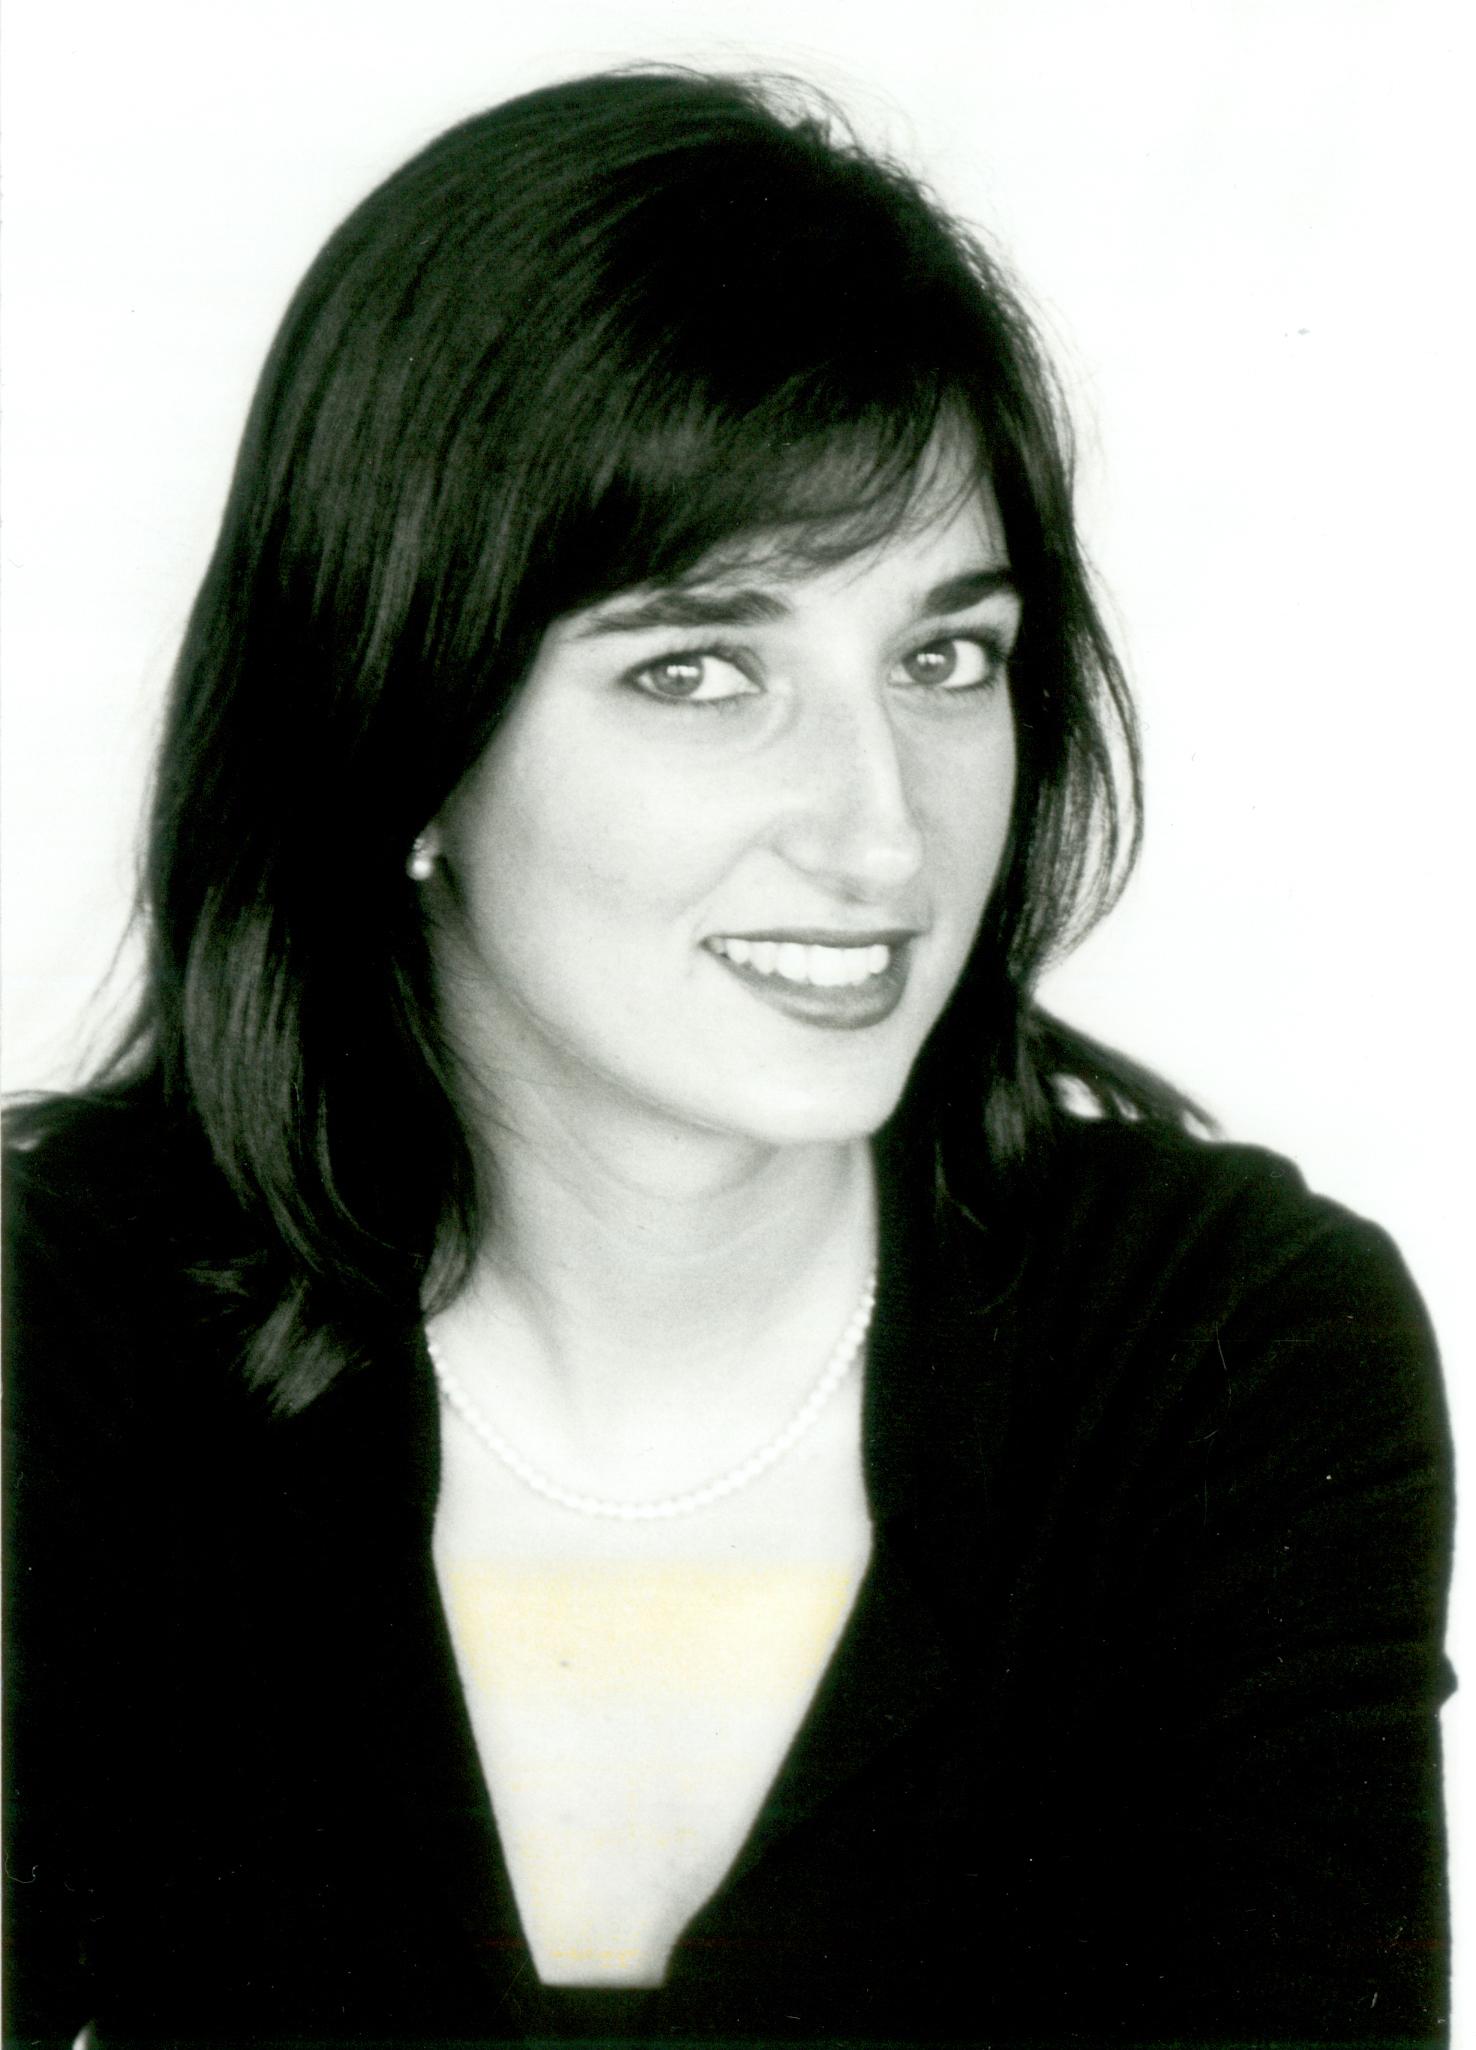 Gertrude E Allen headshot - Alison Cayne